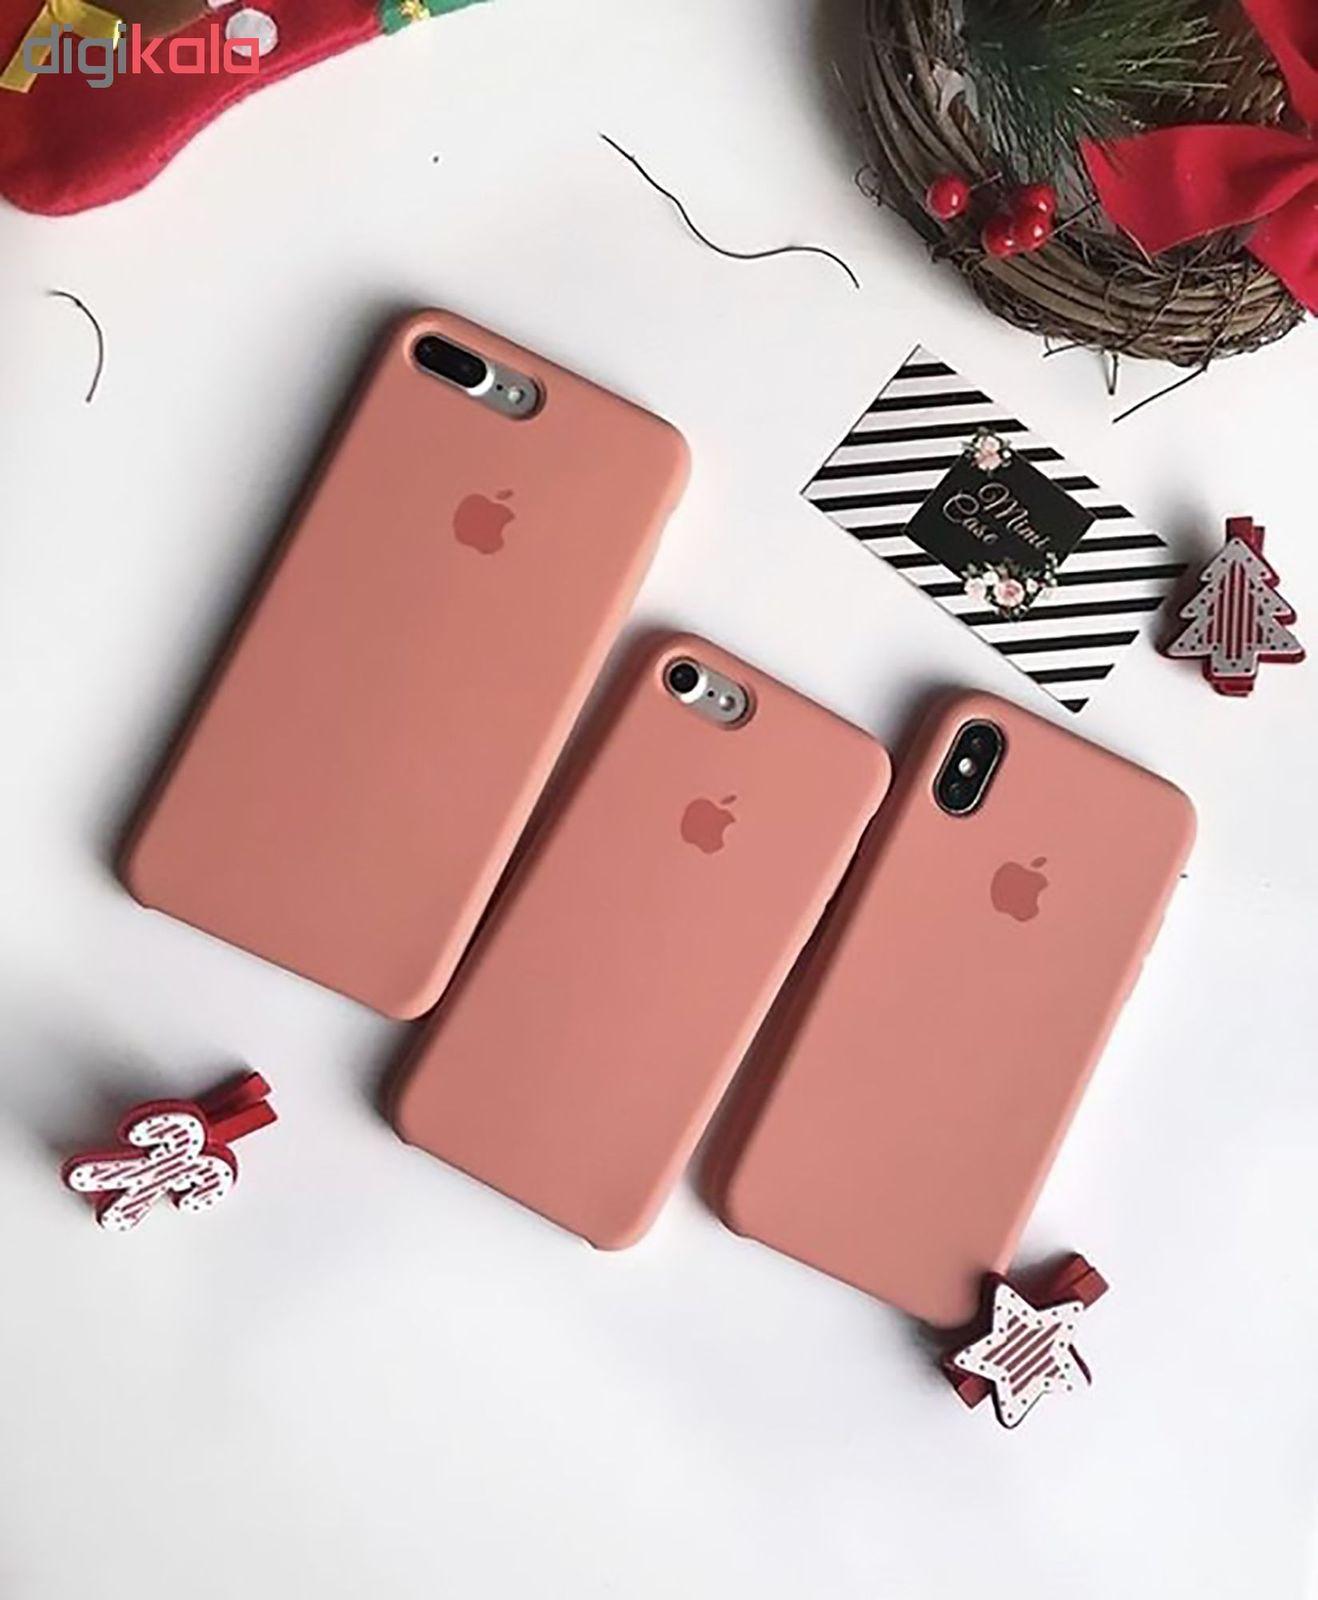 کاور مدل Silc مناسب برای گوشی موبایل اپل  Iphone 8 plus / iphone 7plus main 1 18